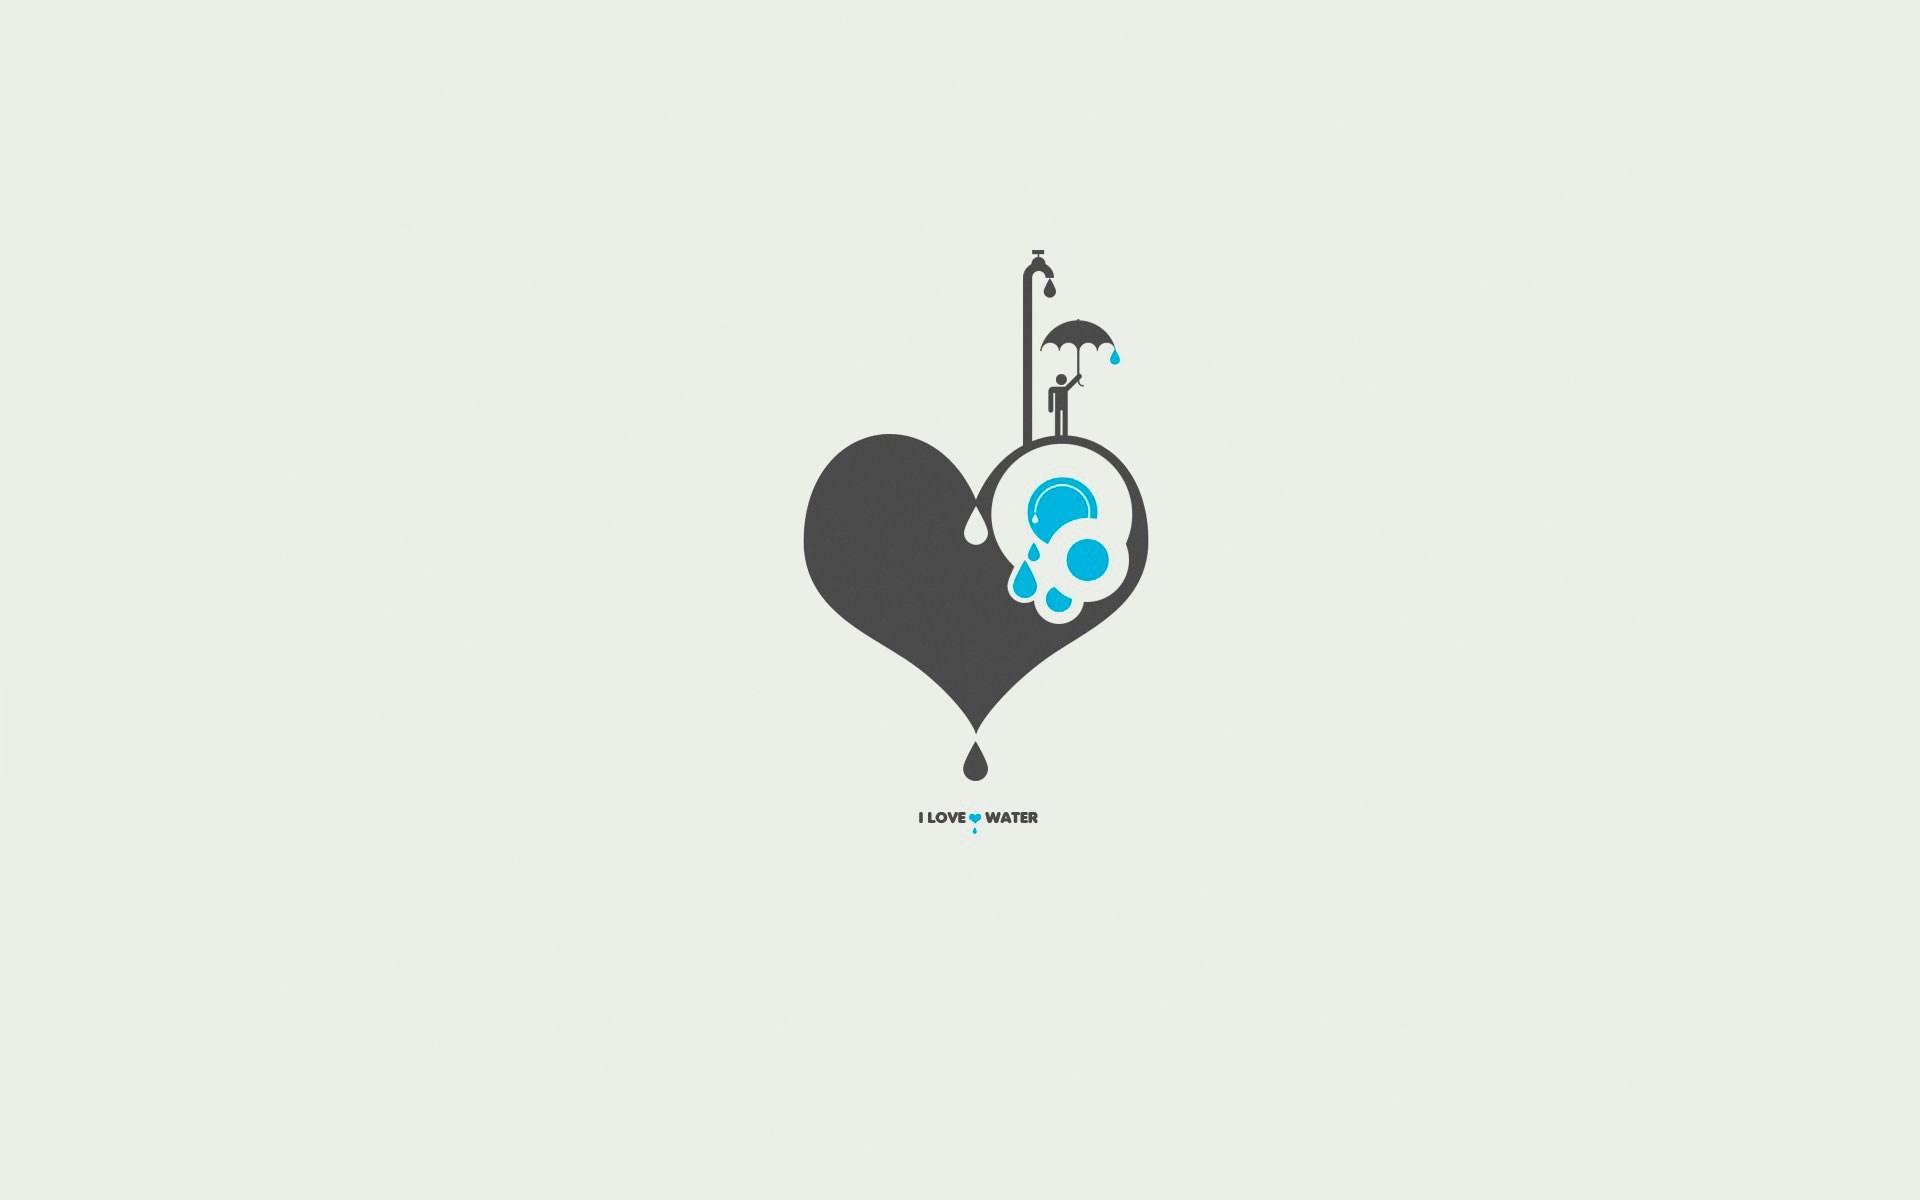 I love water heart